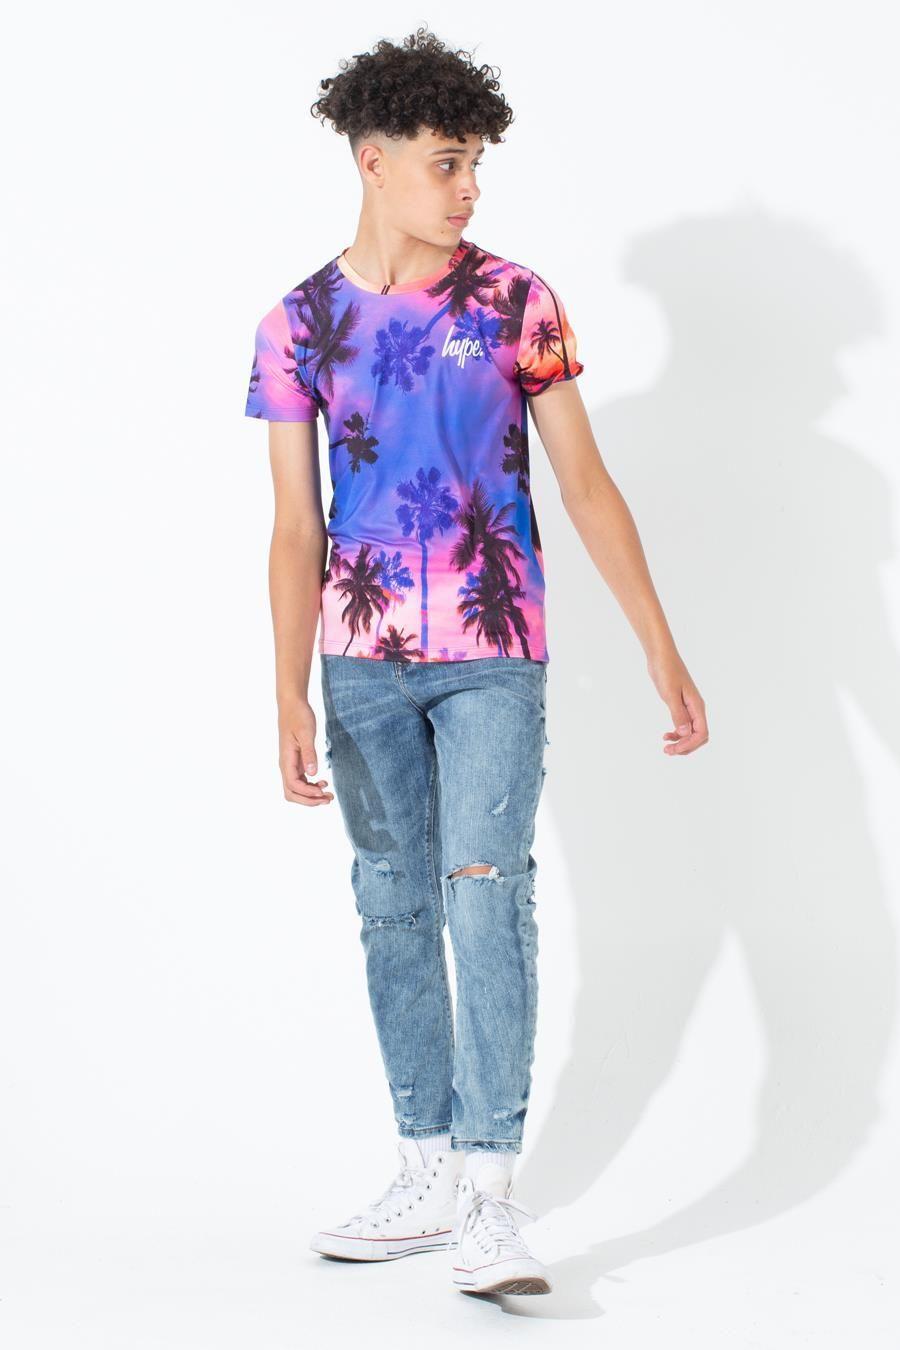 Hype Palm Physics Kids T-Shirt